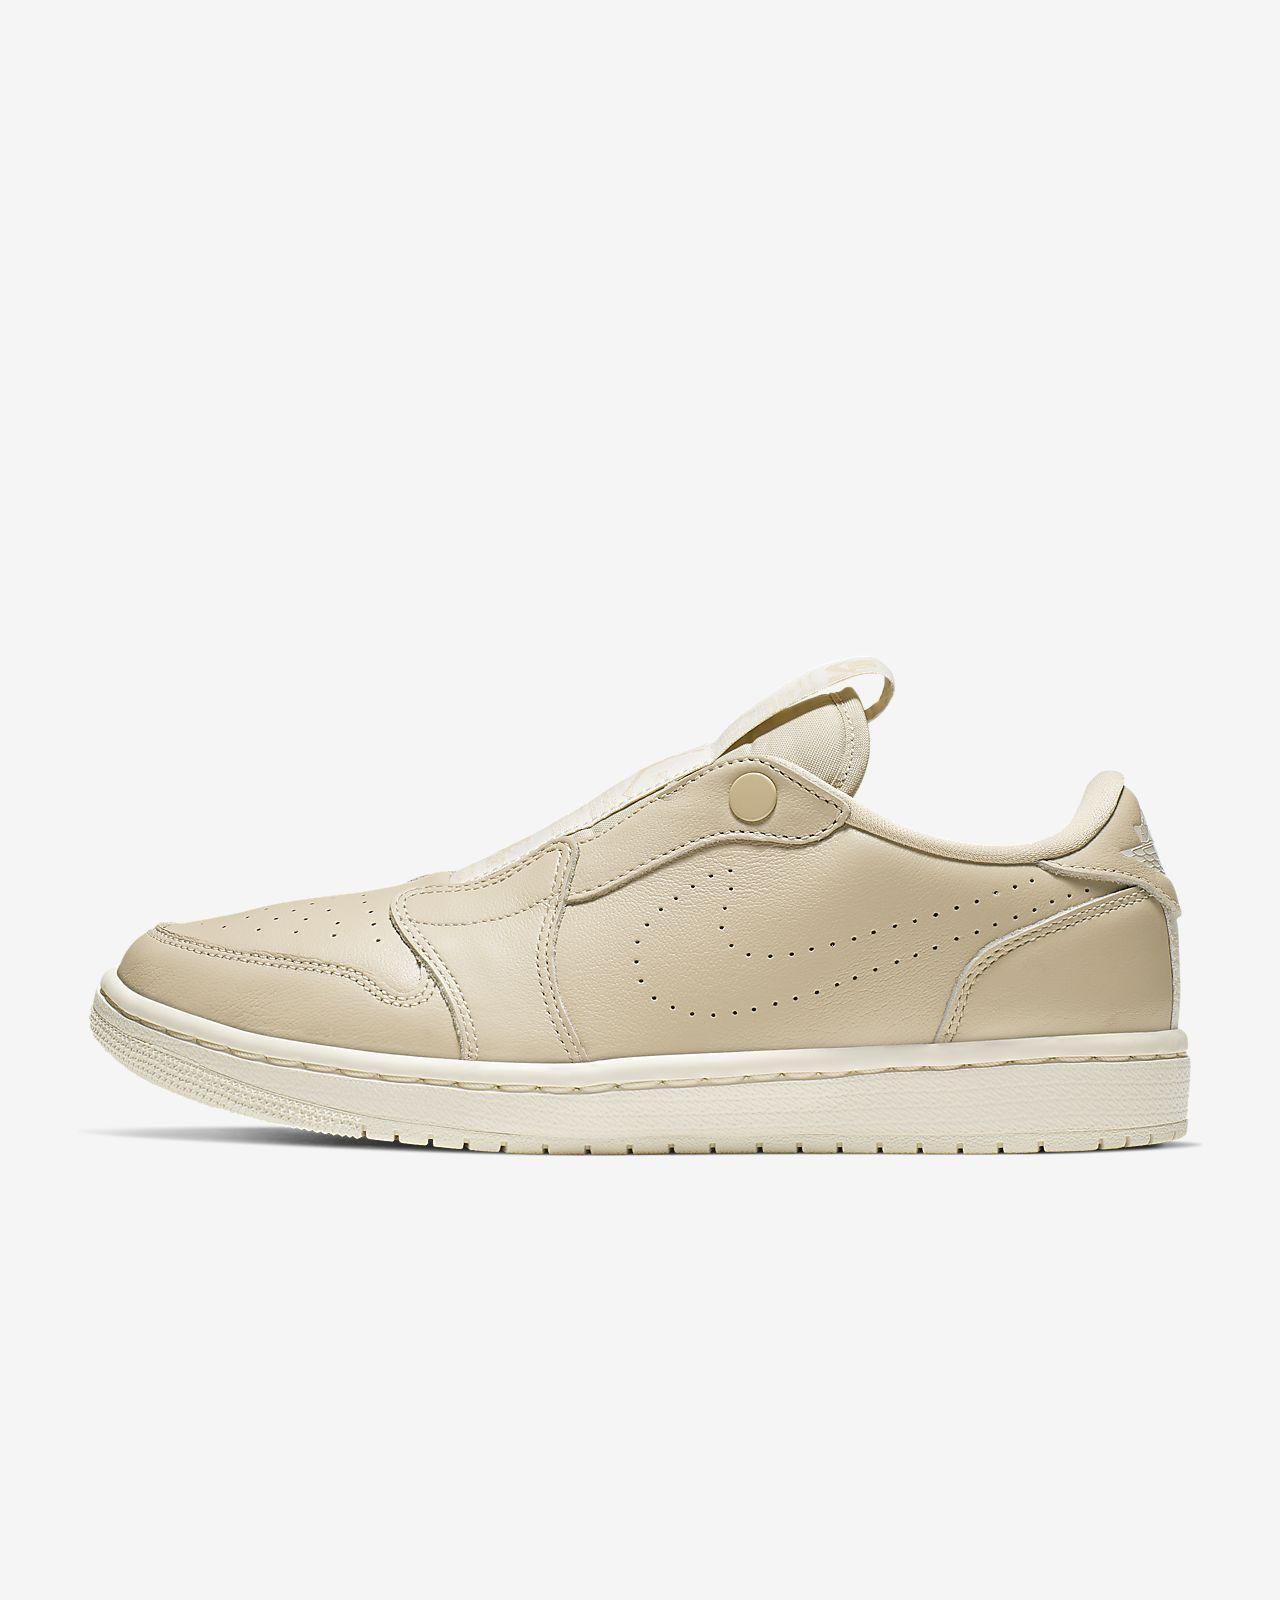 ee06dd13463 Air Jordan 1 Retro Low Slip Women s Shoe. Nike.com CA